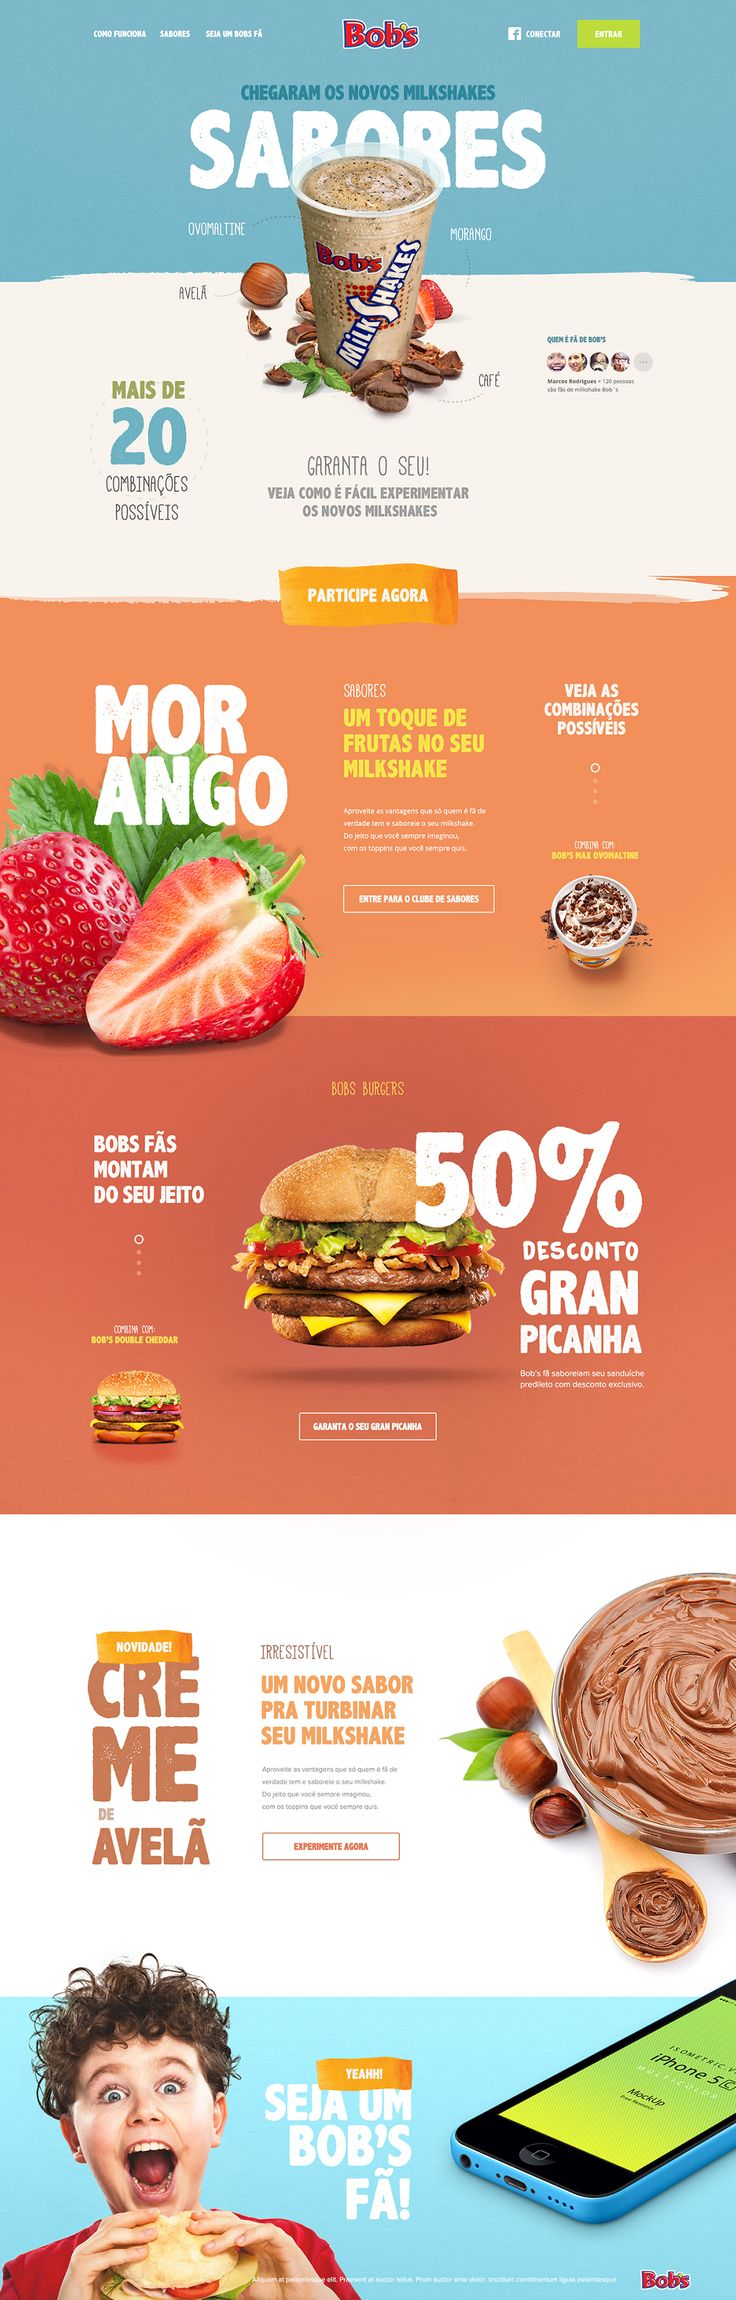 JP Teixeira · Designer · Bobs Burger